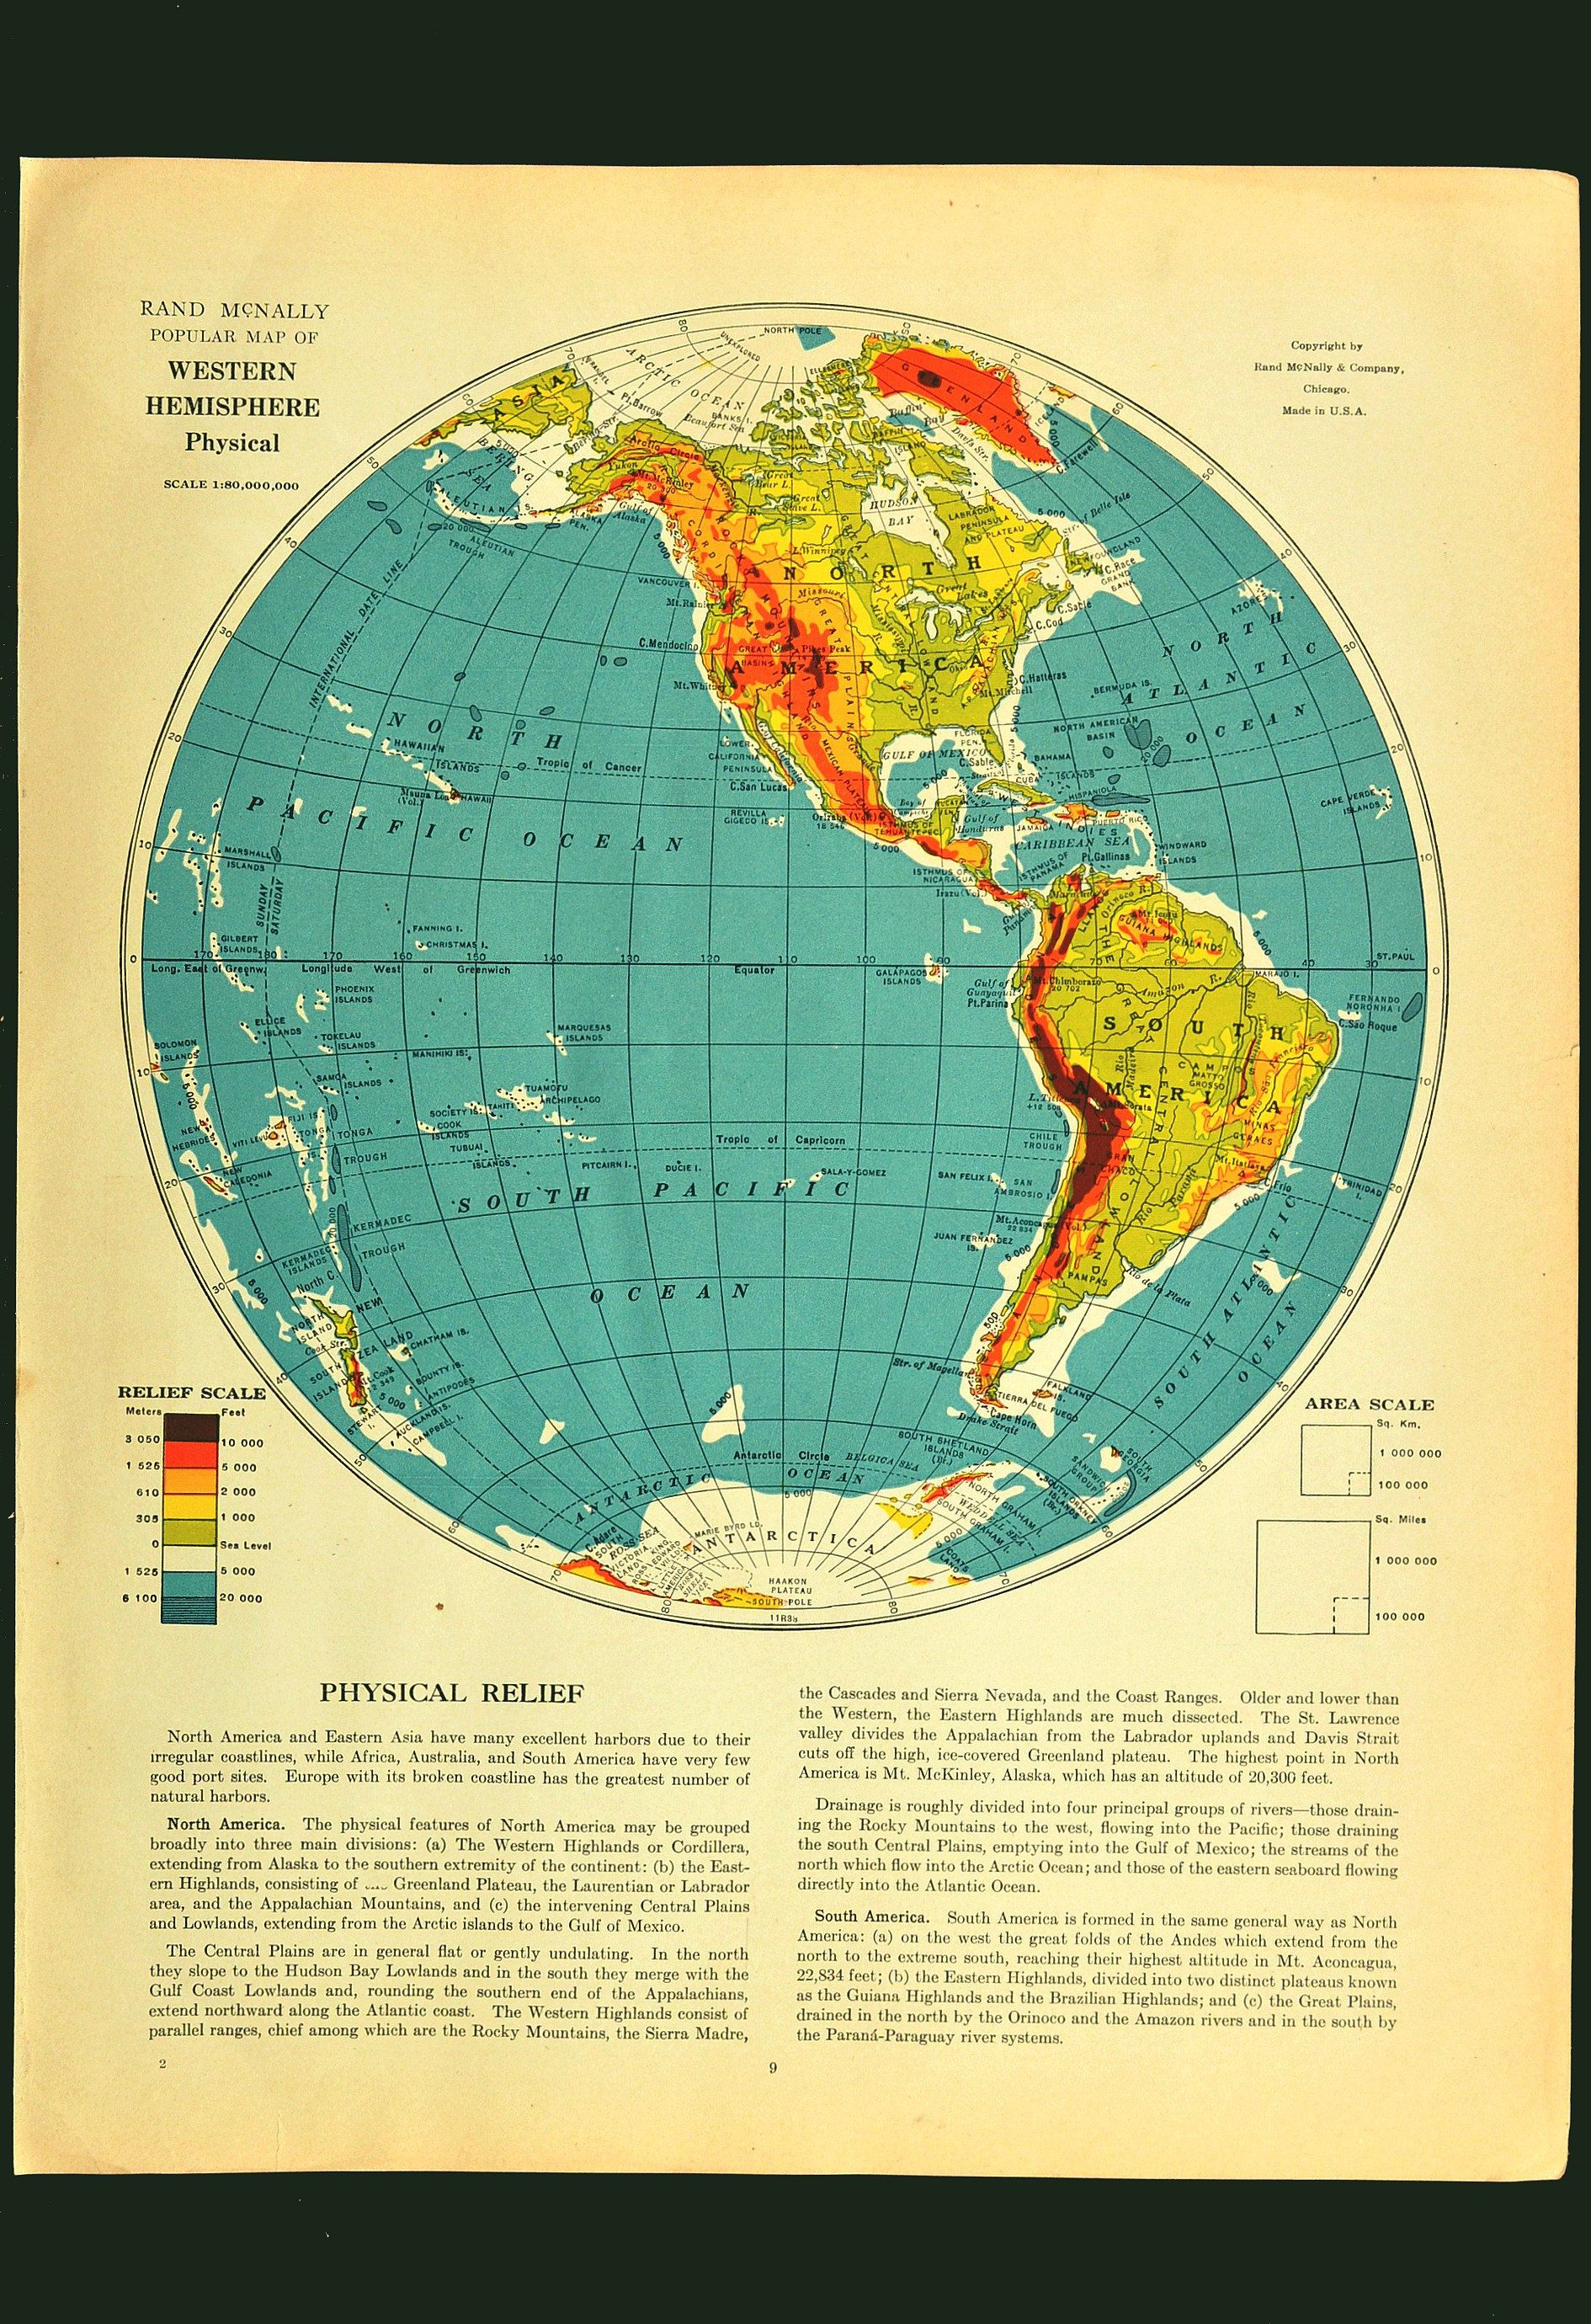 Western Hemisphere Map Of The Western Hemisphere Wall Art